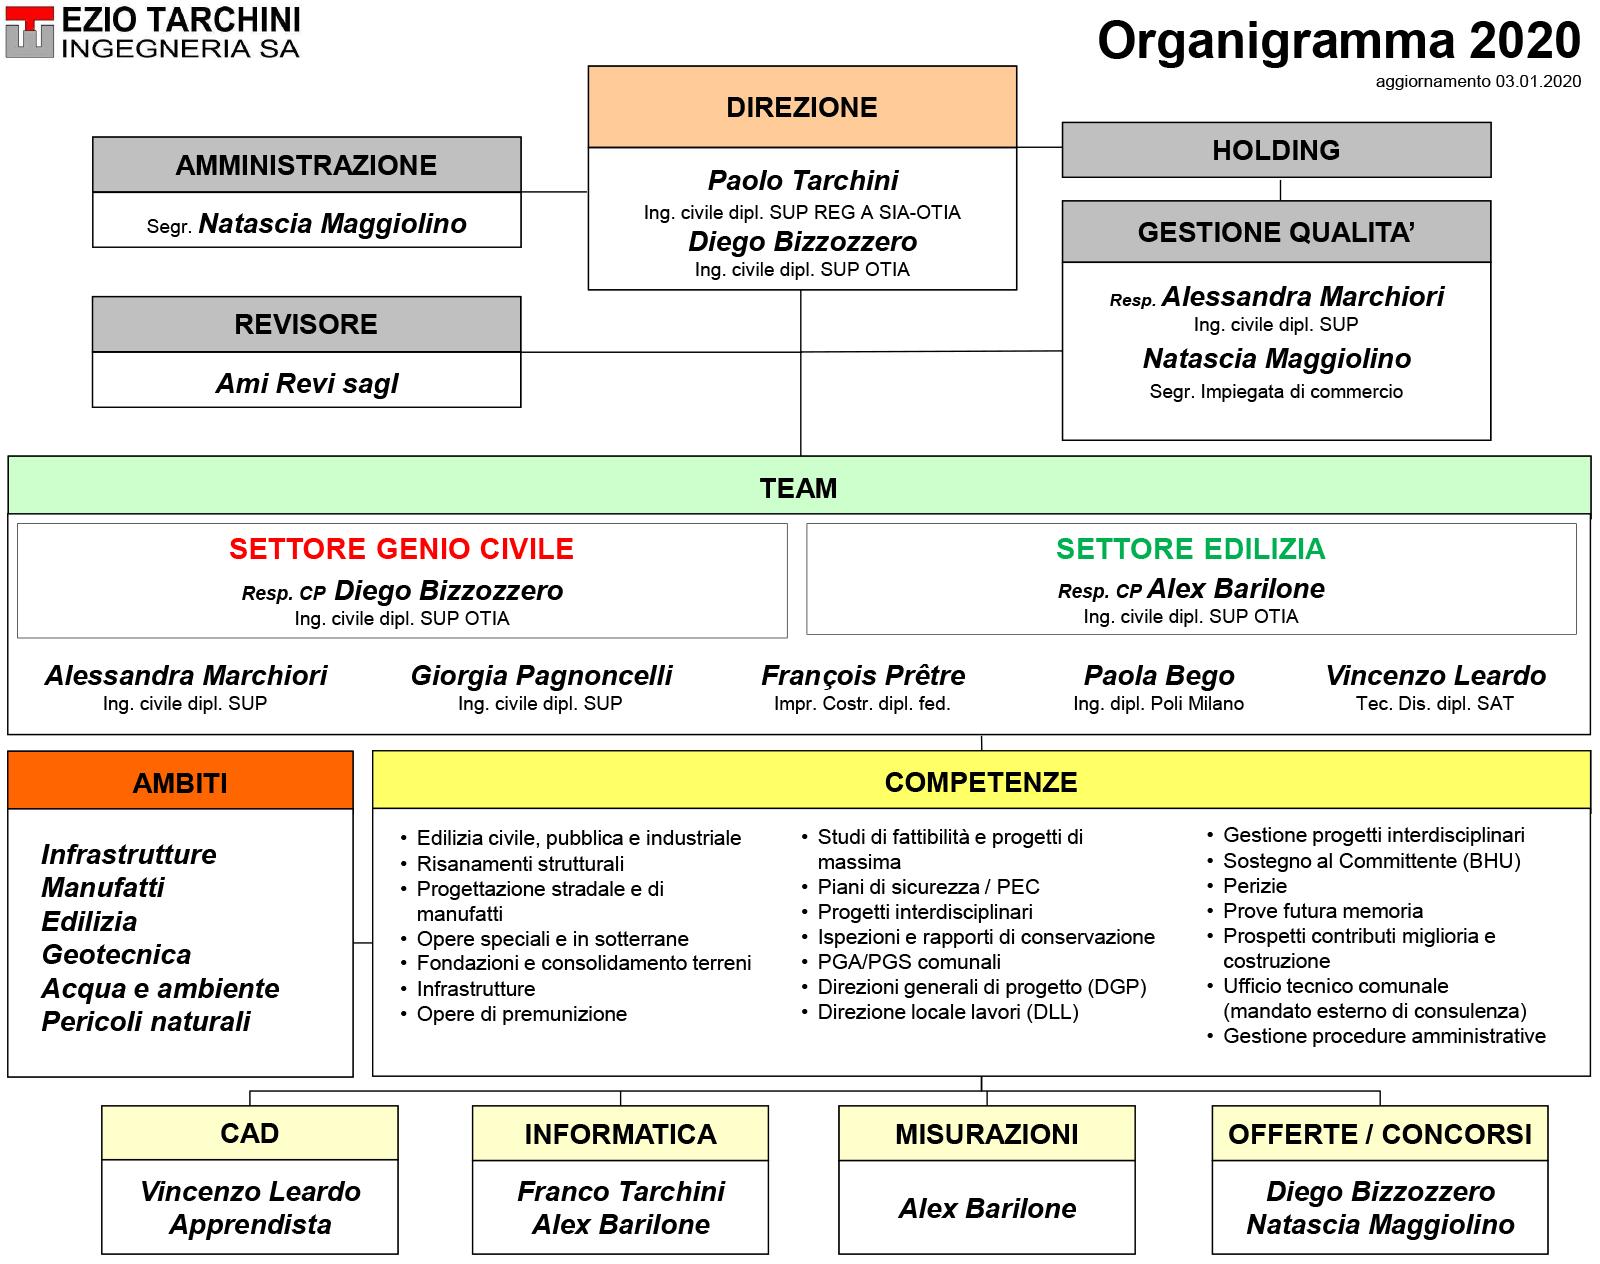 organigramma-2020